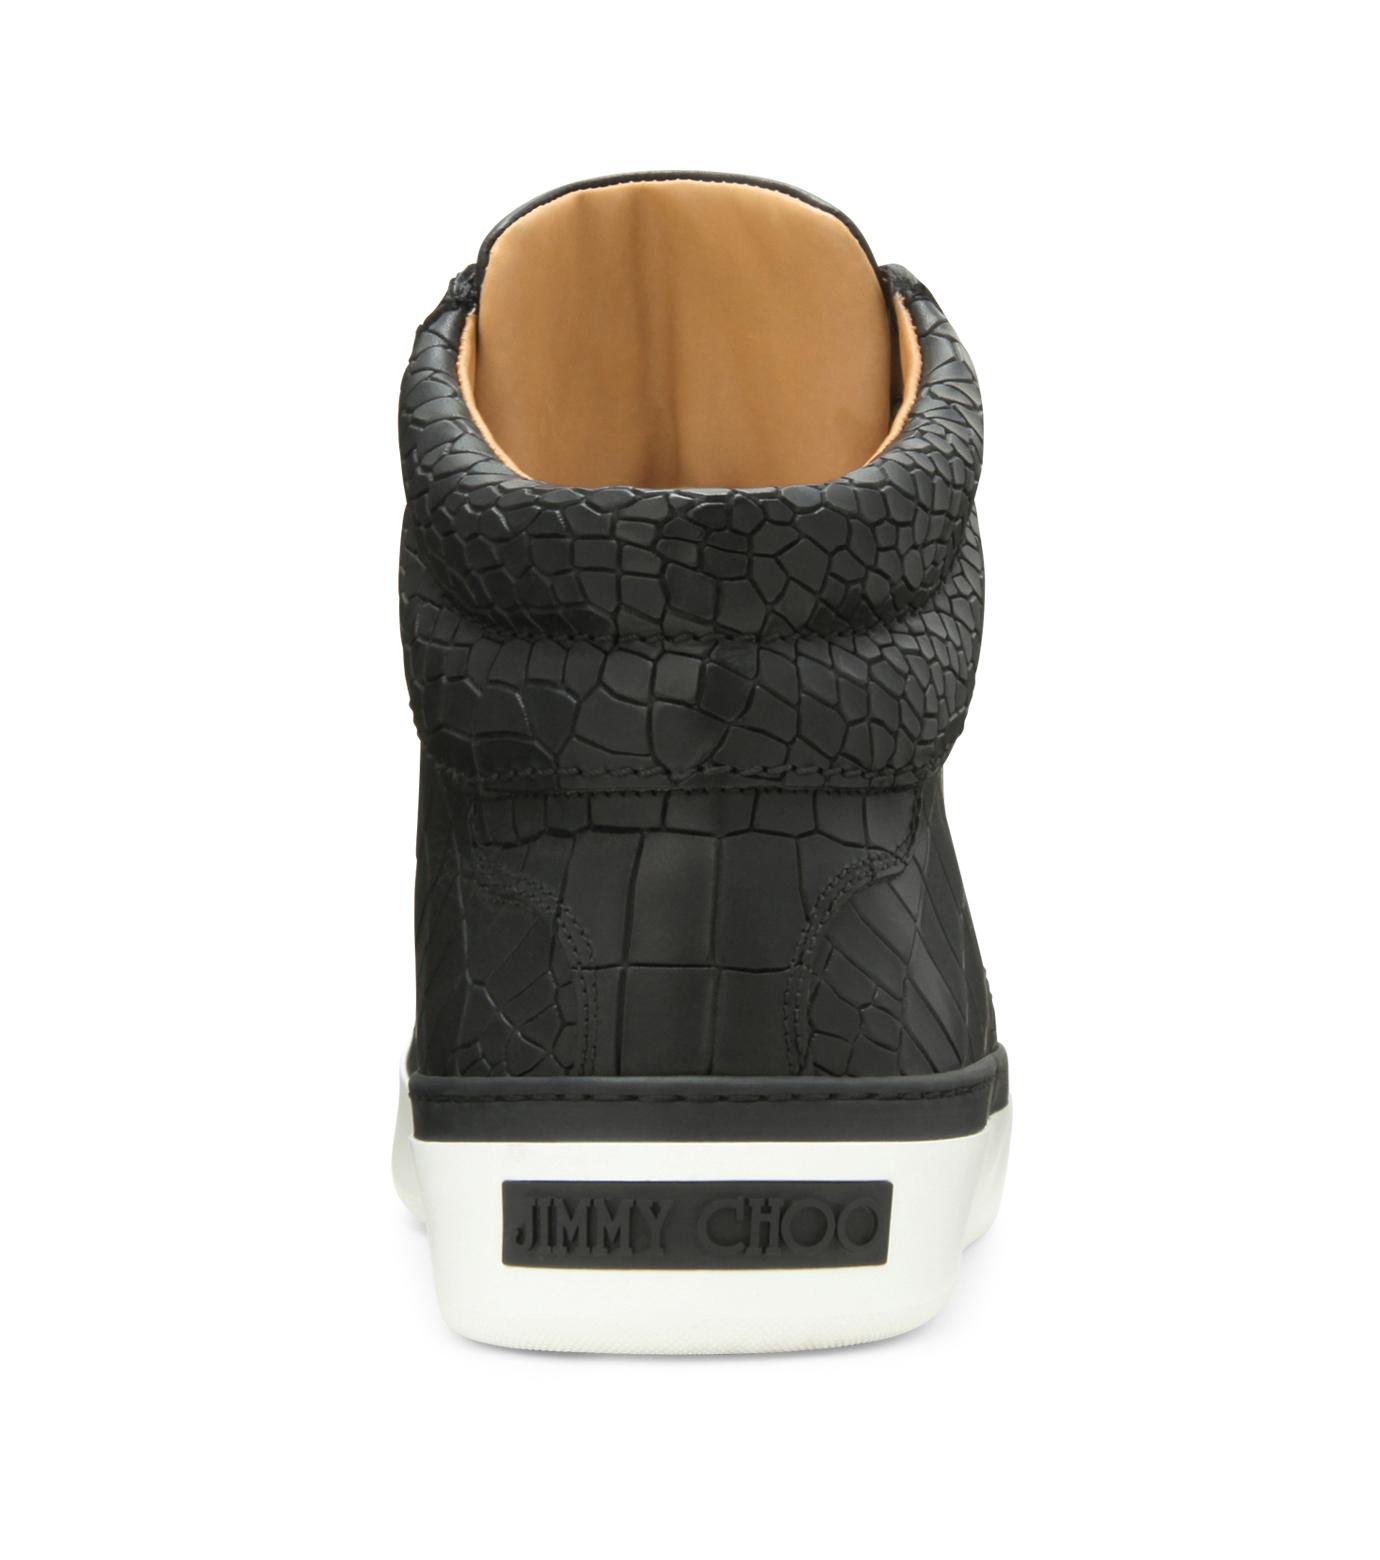 Jimmy Choo(ジミーチュウ)のCroco emboss sneaker-BLACK-BELGRAVI-CCL-13 拡大詳細画像3